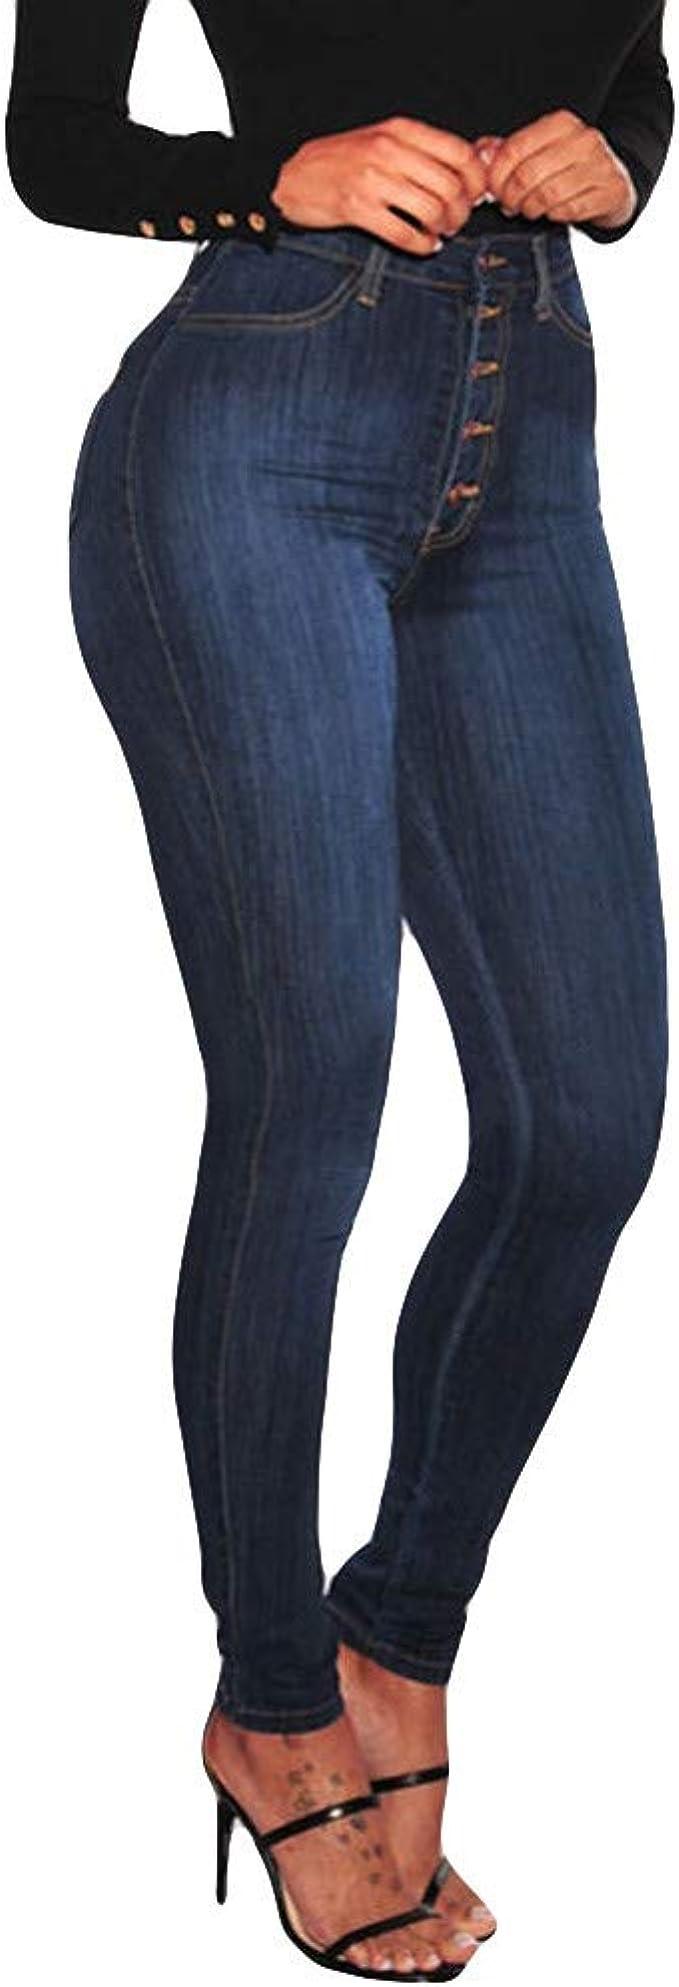 NEW J/&K mix PLUS SIZE WOMEN/'S Stretch BLUE denim jeans SKINNY /& Bootcut  PANTS